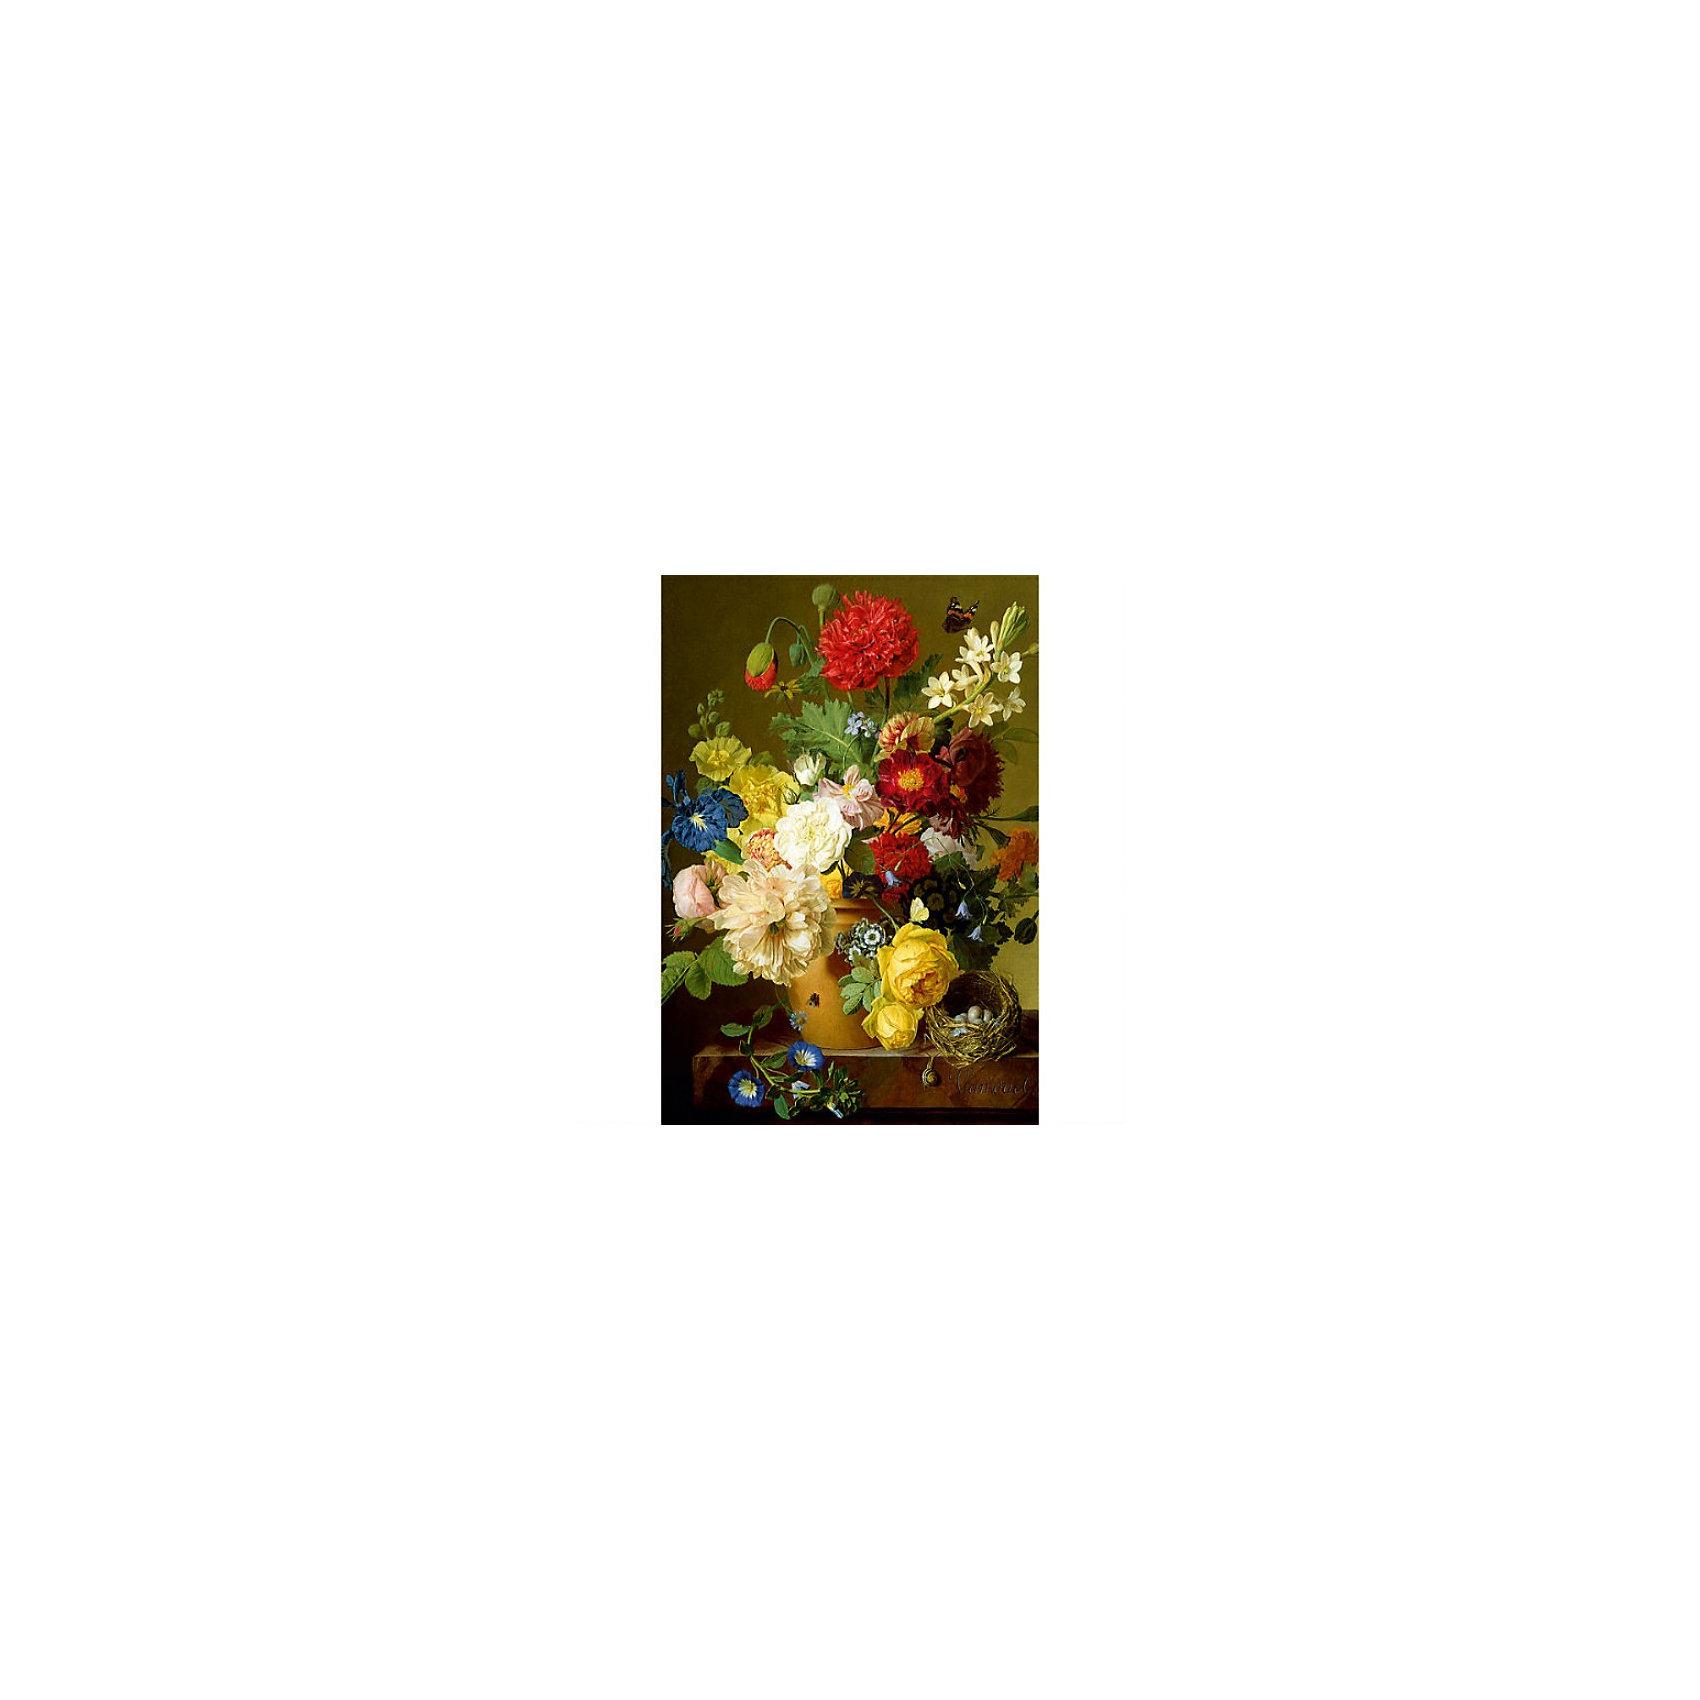 Trefl Пазл  Натюрморт с цветами, 1500 деталей, Trefl trefl детский пазл дасти в небесах 160 деталей самолеты 2